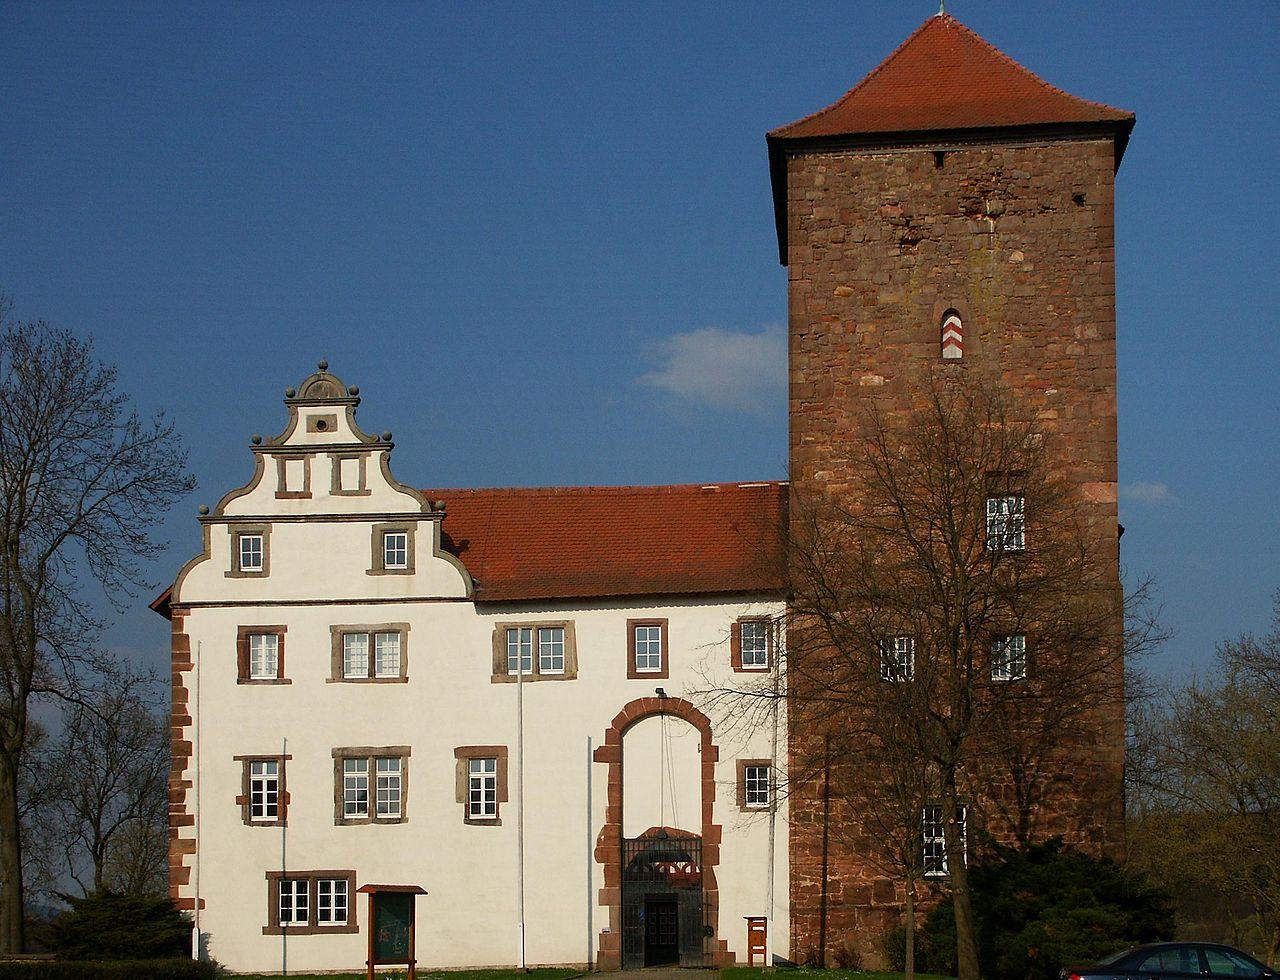 Bild Schloss Eichhof Bad Hersfeld